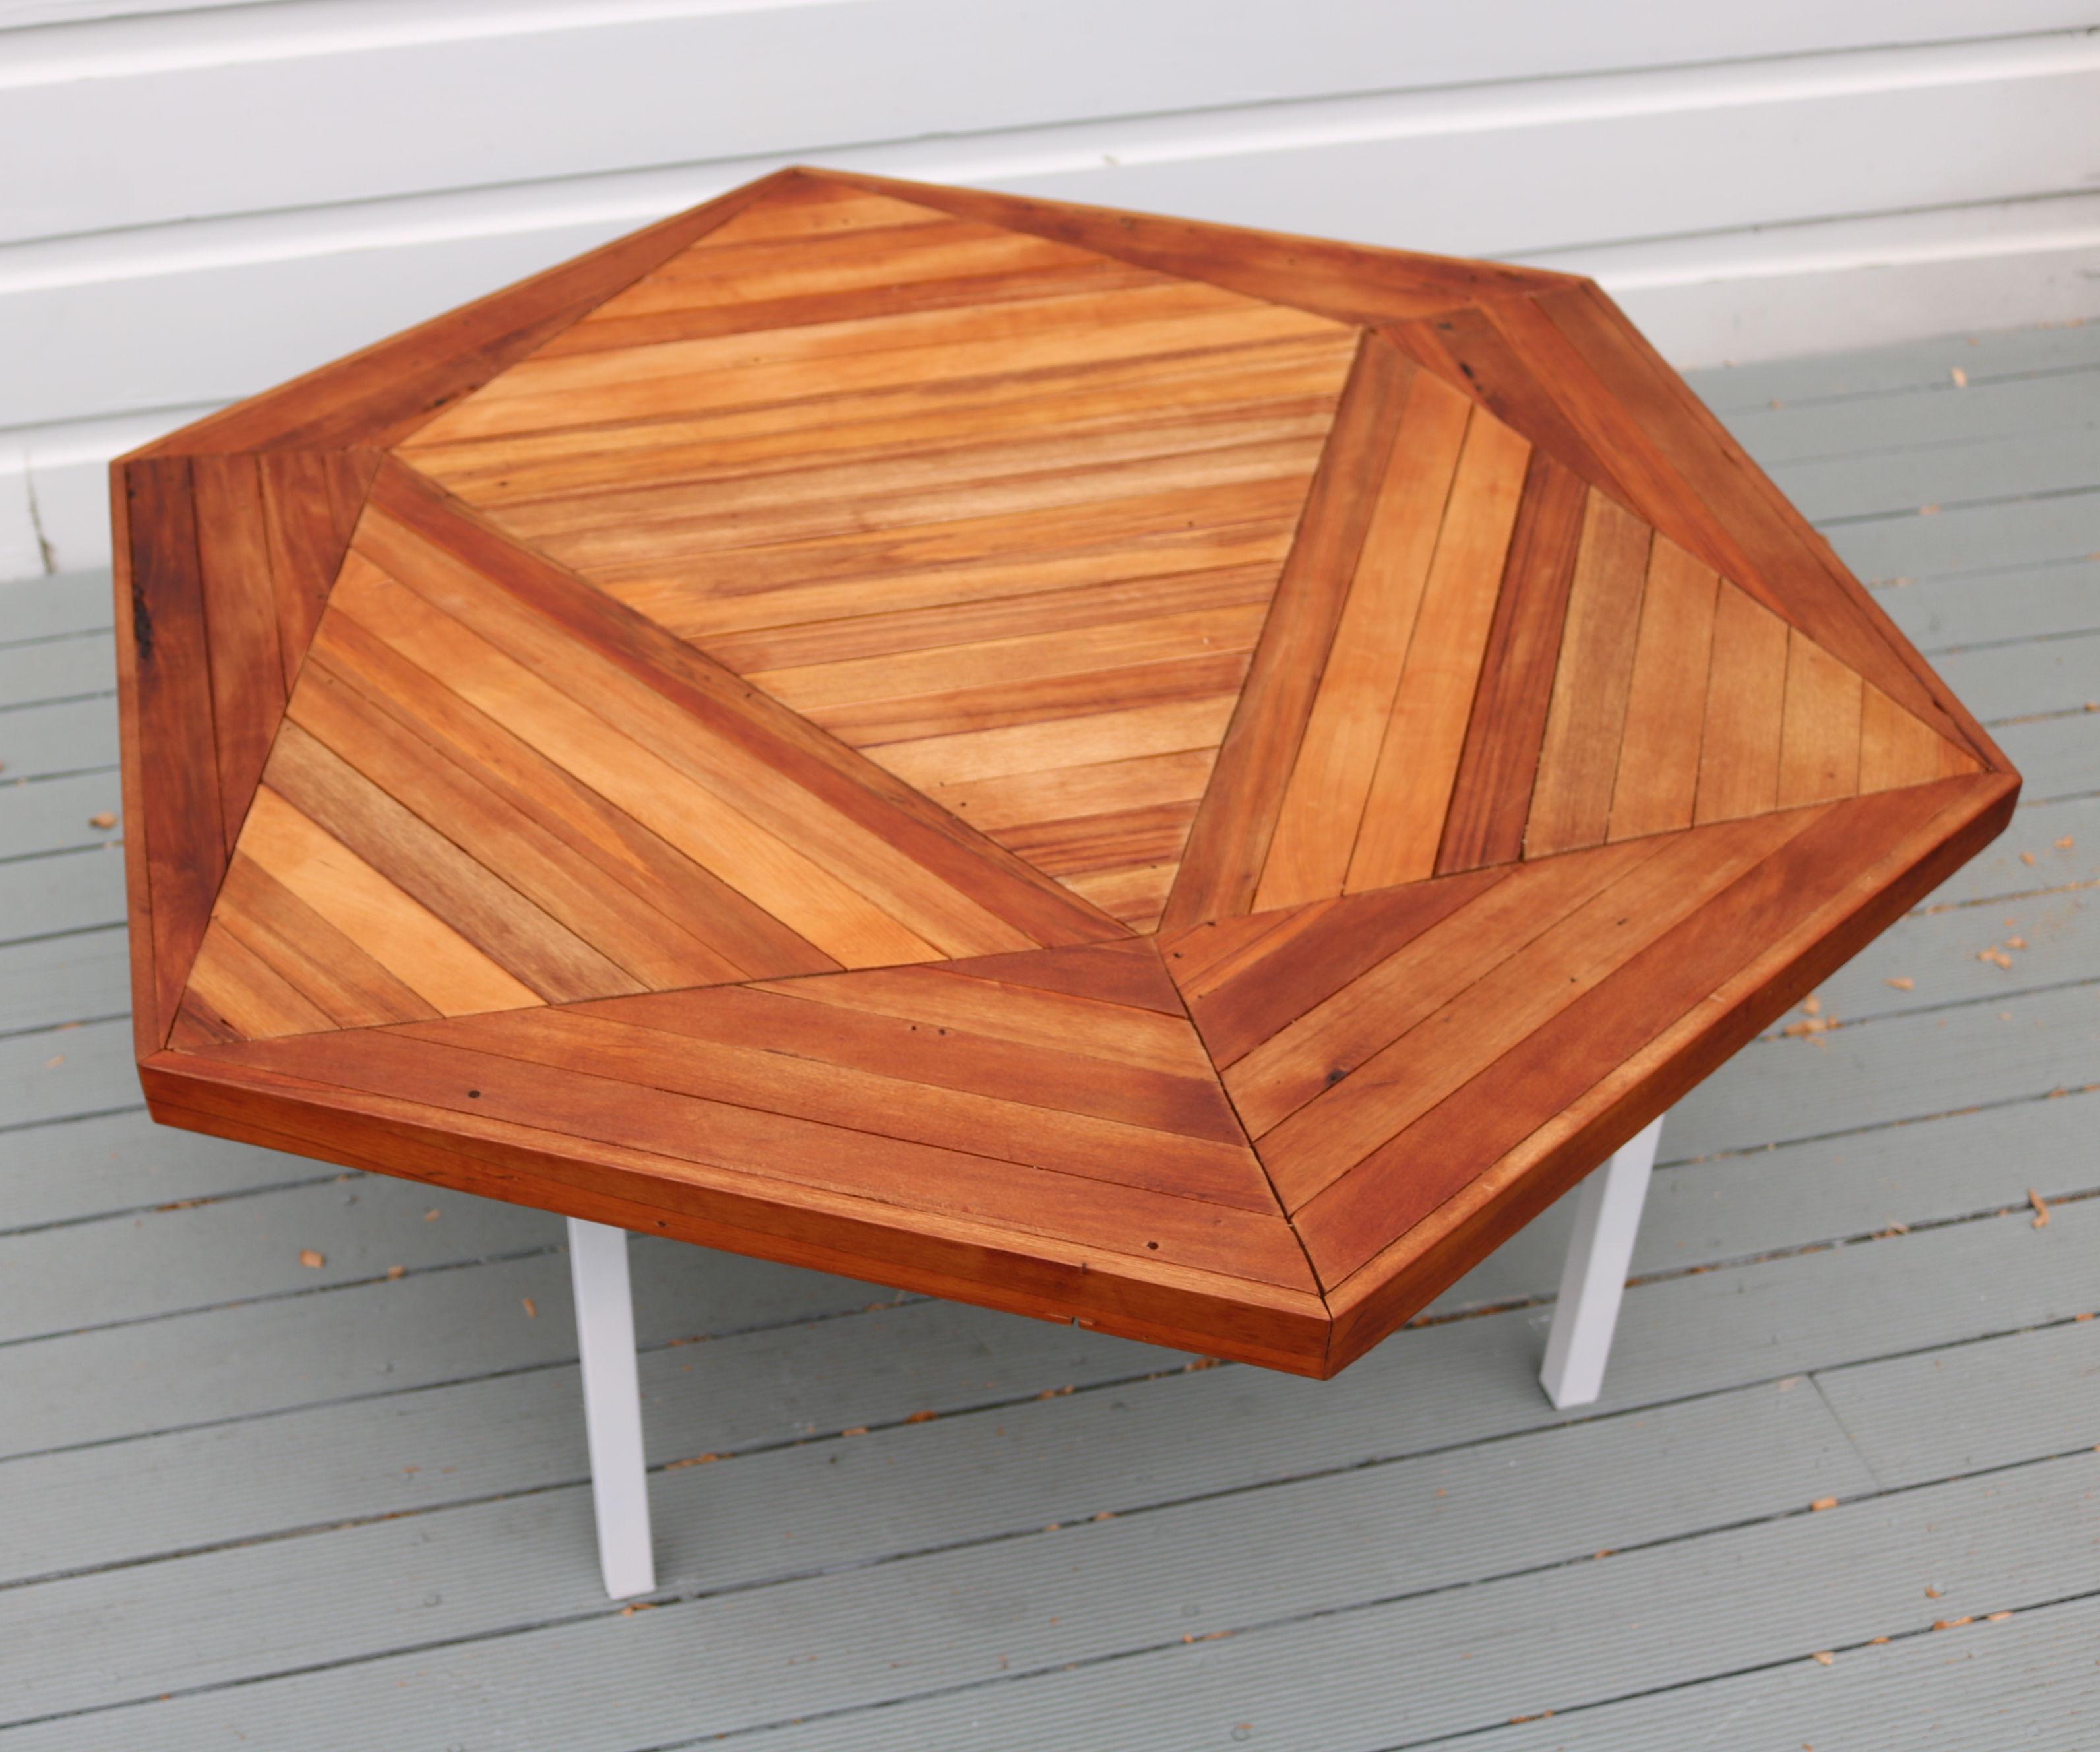 making scrapwood coffee table 11